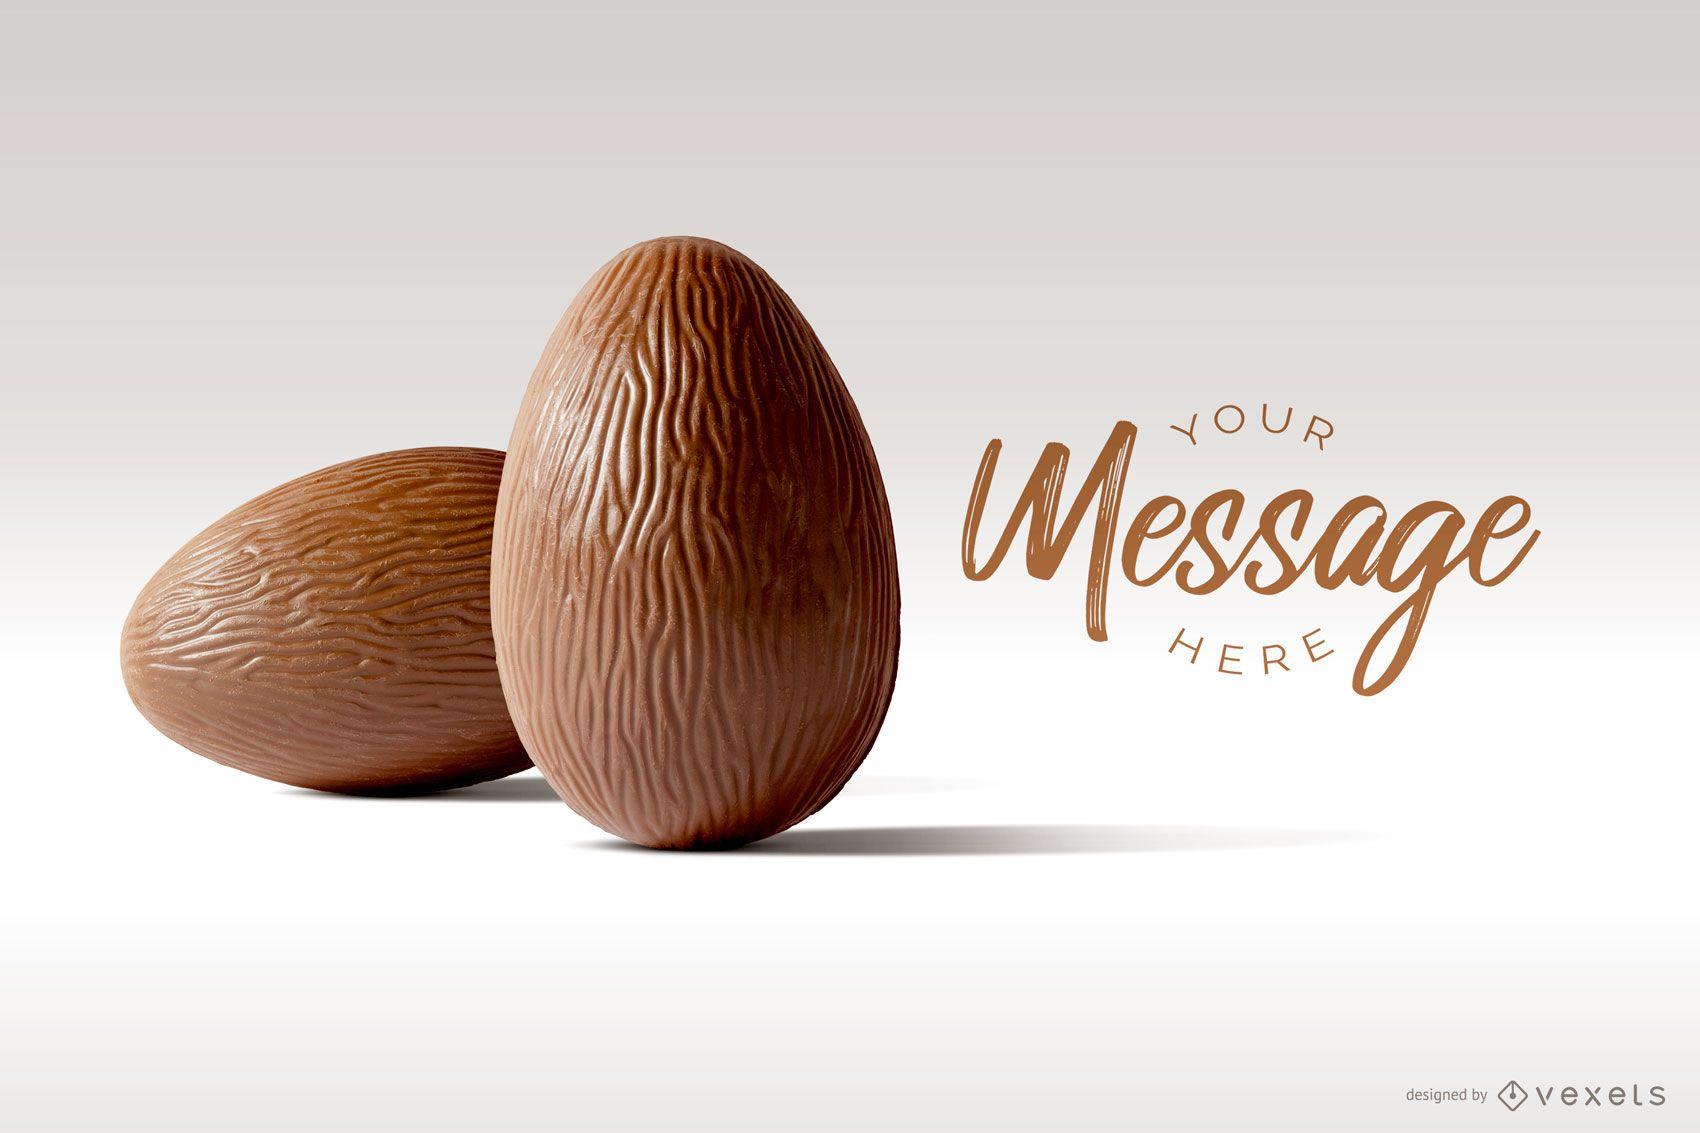 Maqueta de imagen de huevo de Pascua de chocolate